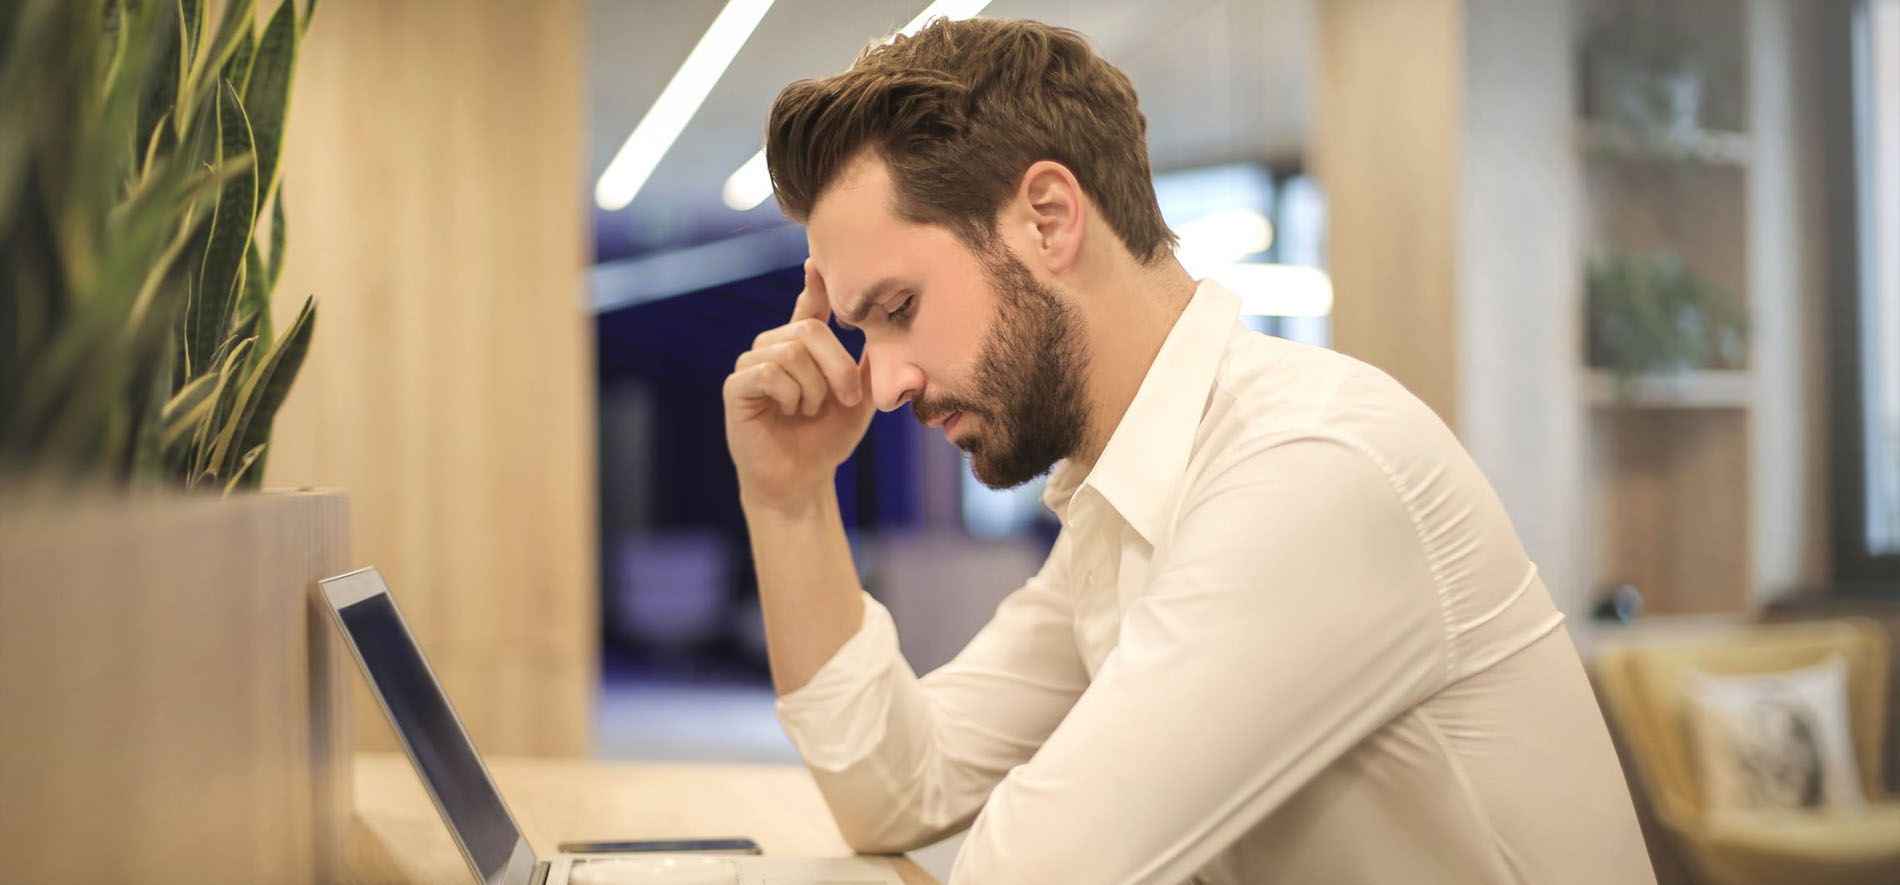 6 Reasons Mobility Is Giving CIOs Headaches